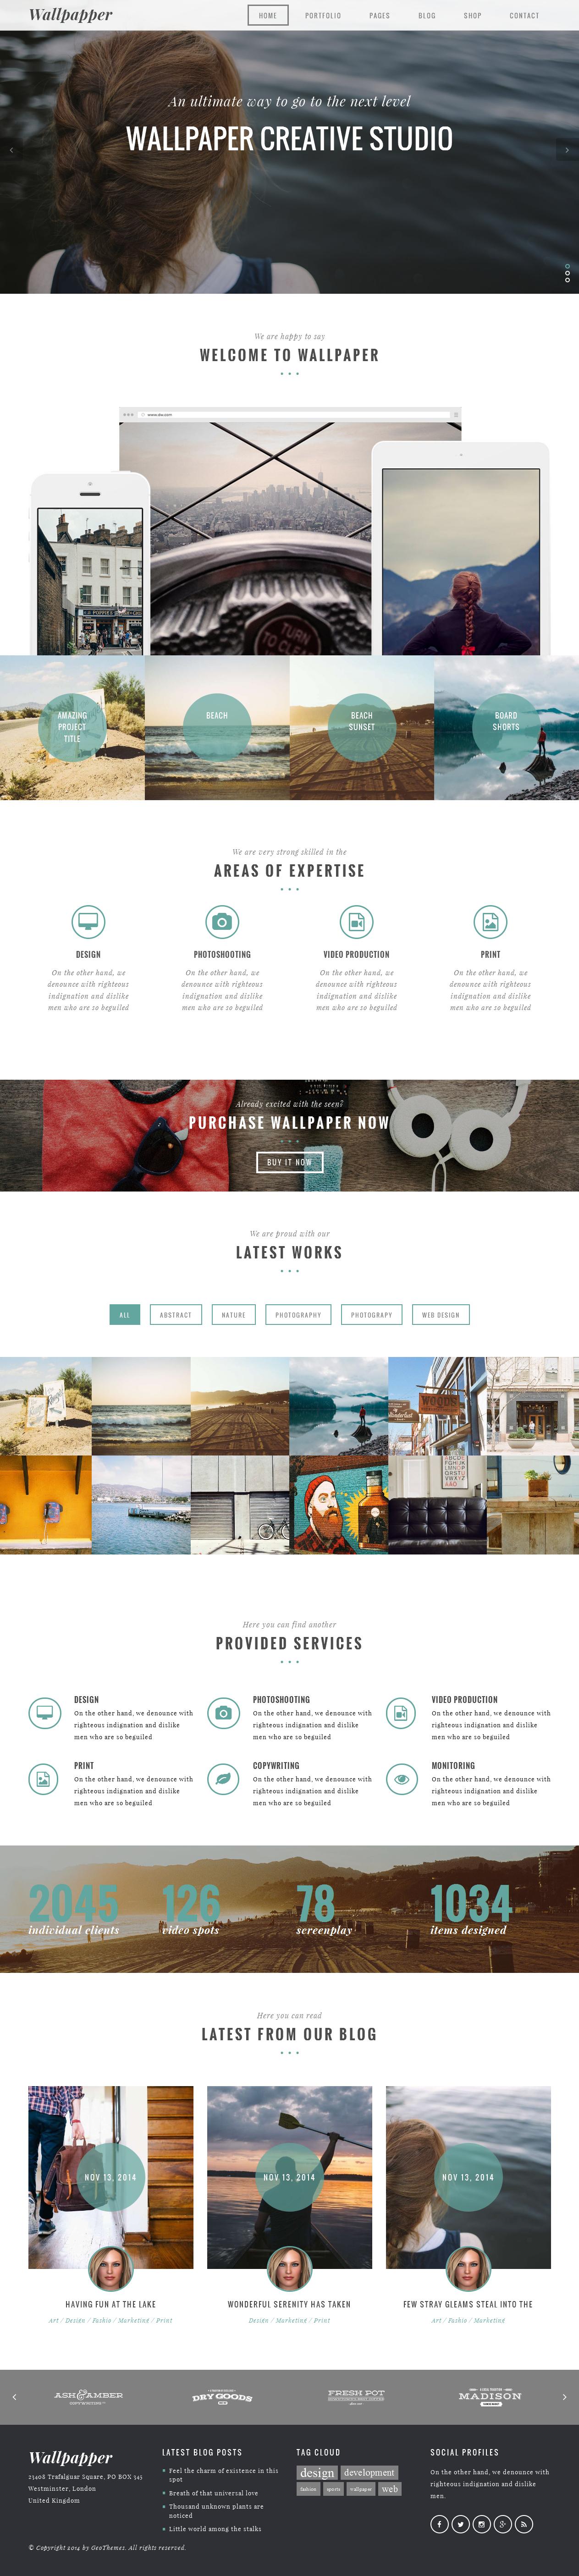 Wallpaper - Multi-Purpose Wordpress Theme | Wordpress